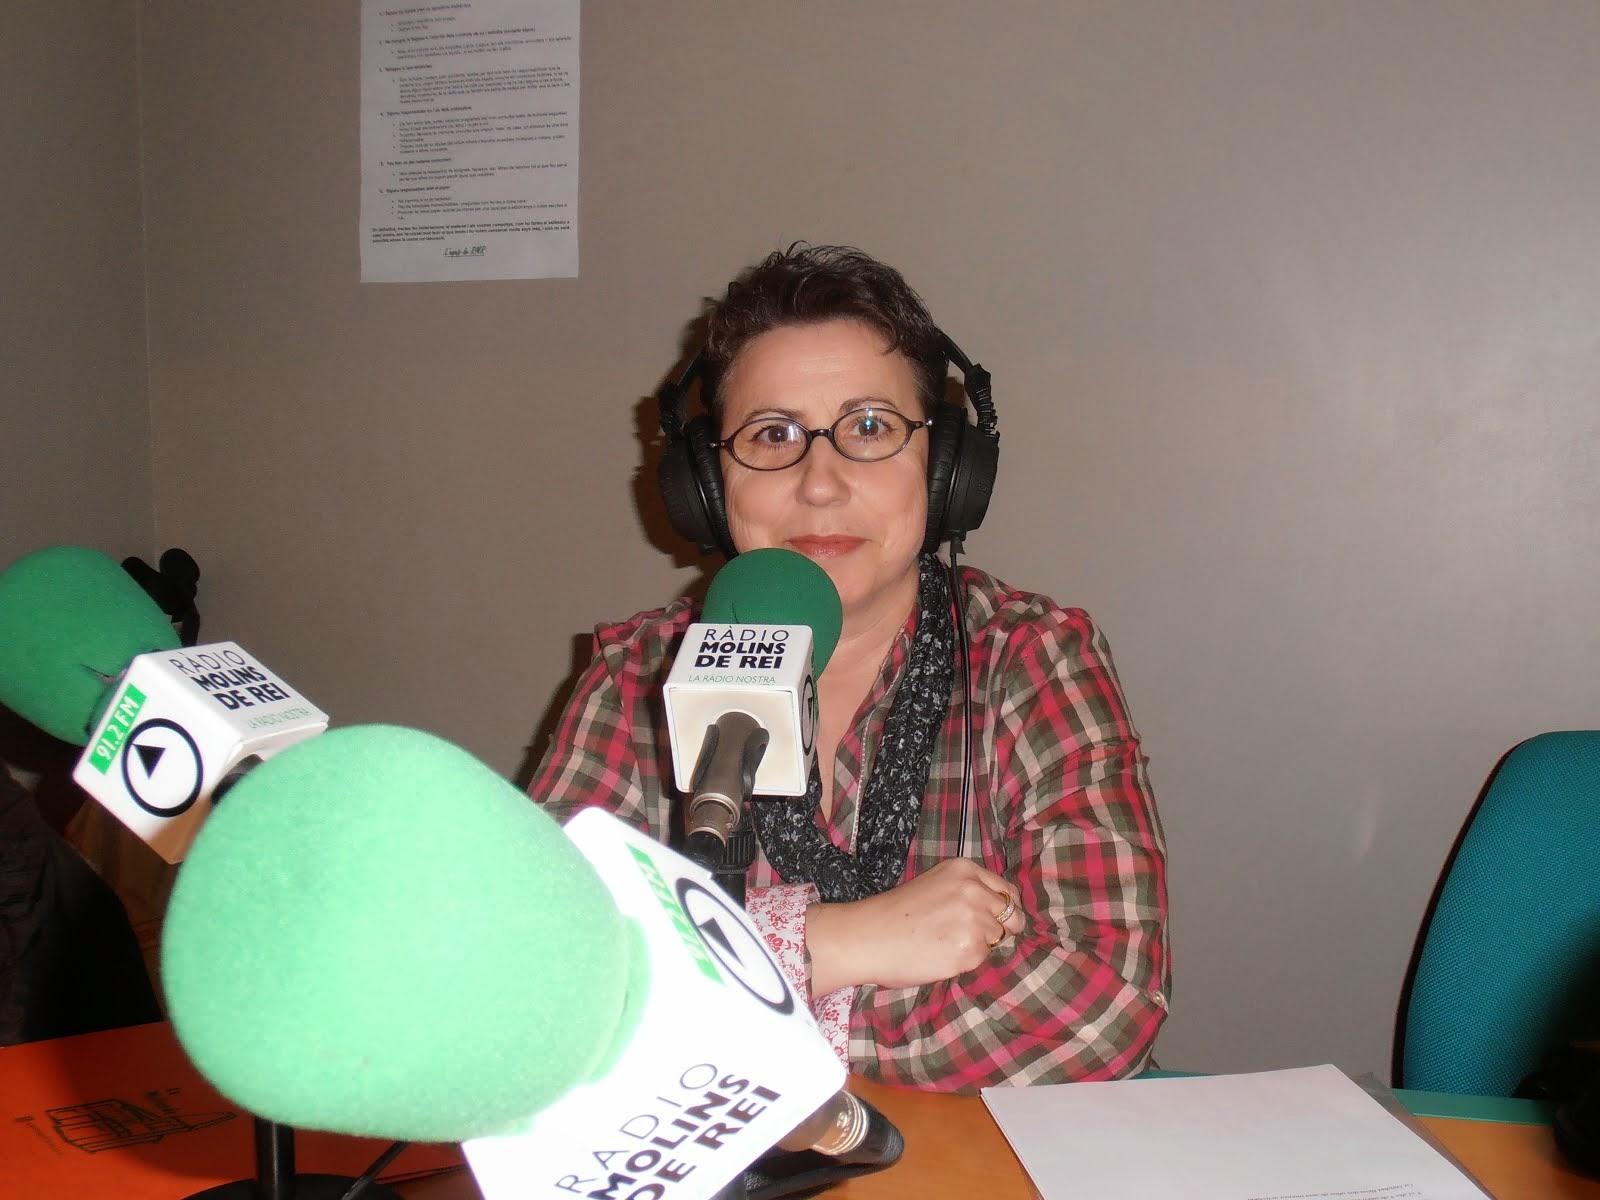 Entrevista en Radio Molins de Rei  en el programa Moments Amb Tessa Mas